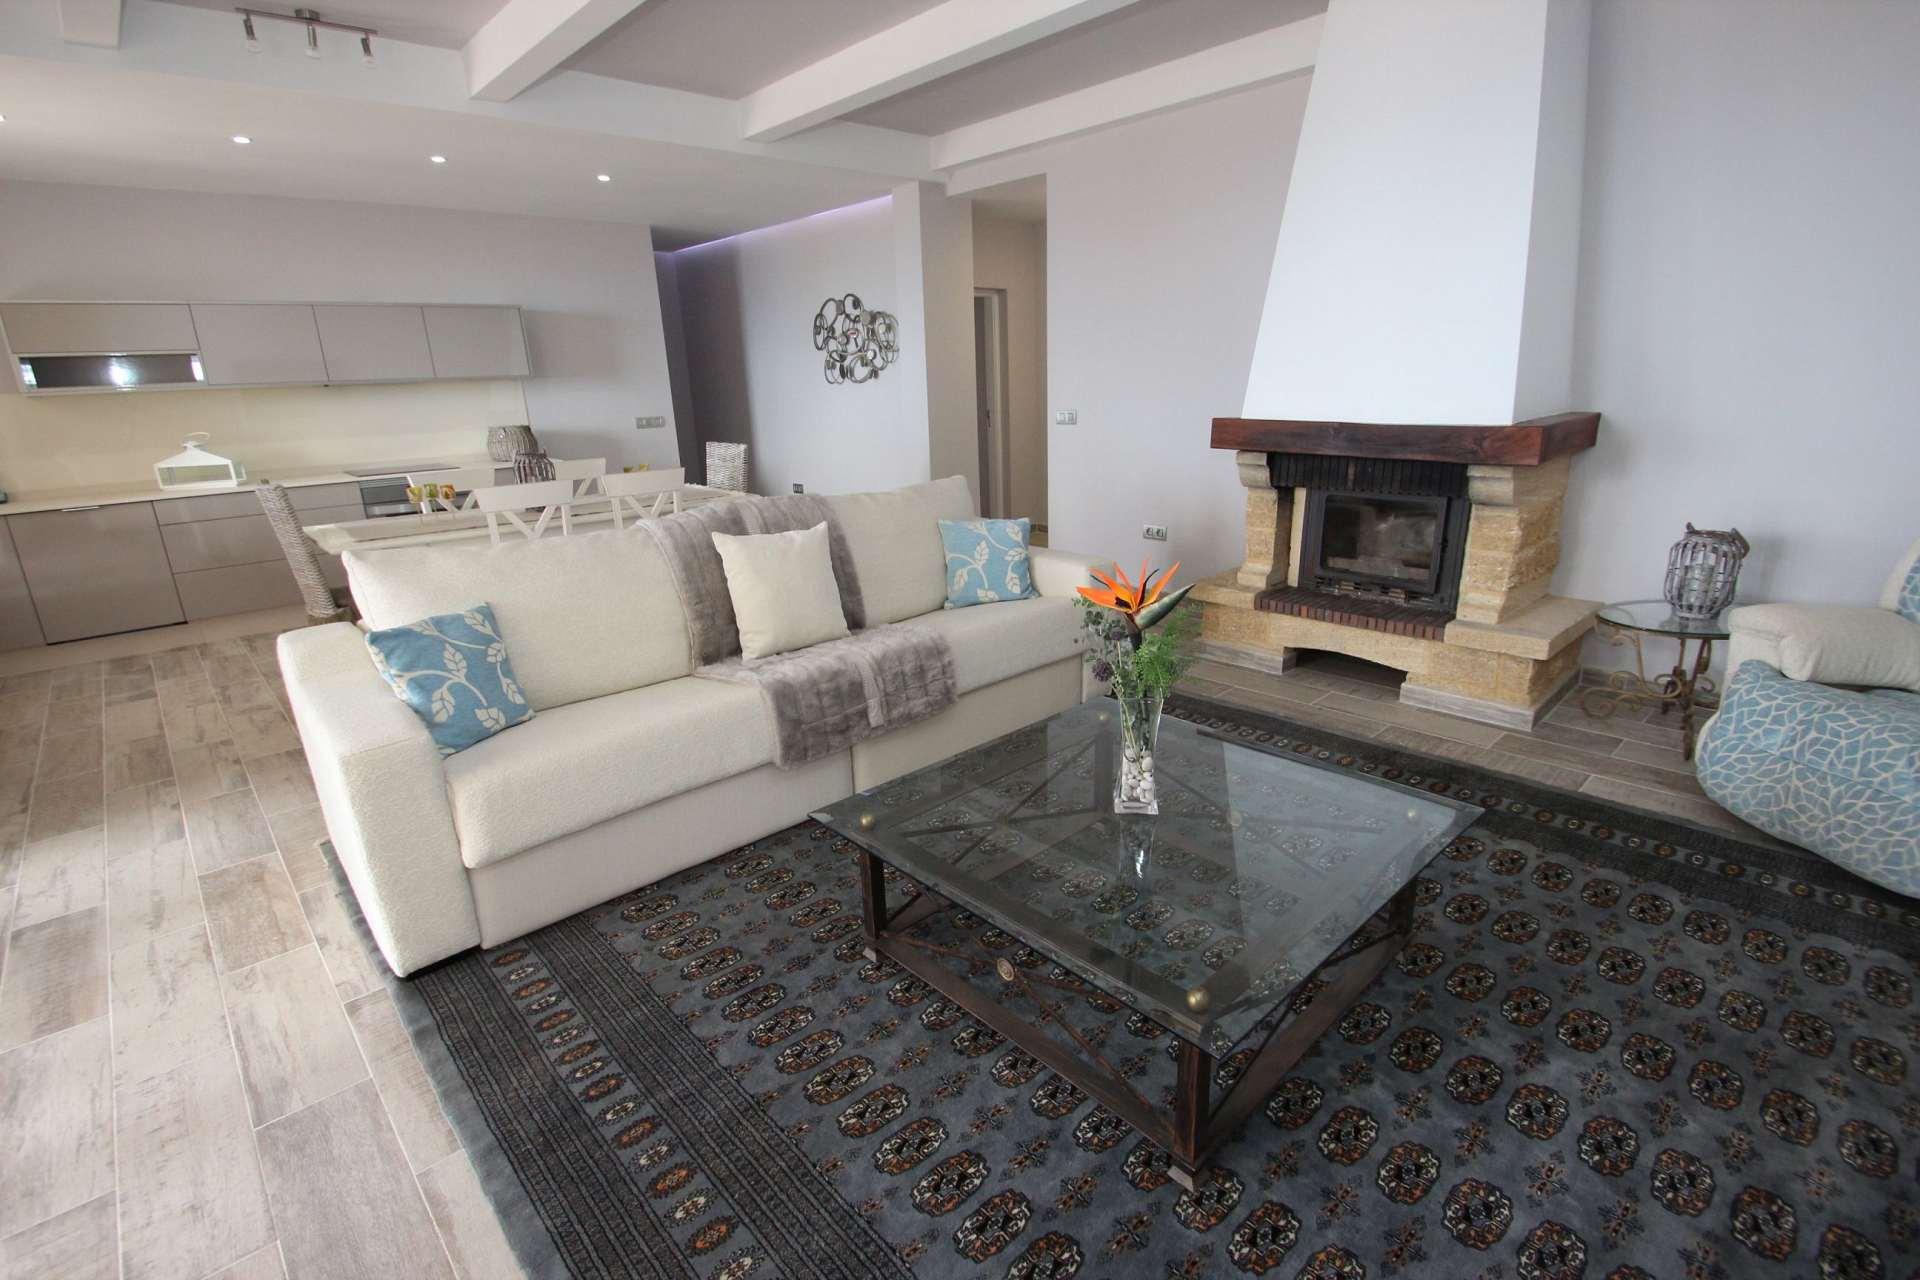 herrenhaus herrenhaus teneriffa s d. Black Bedroom Furniture Sets. Home Design Ideas